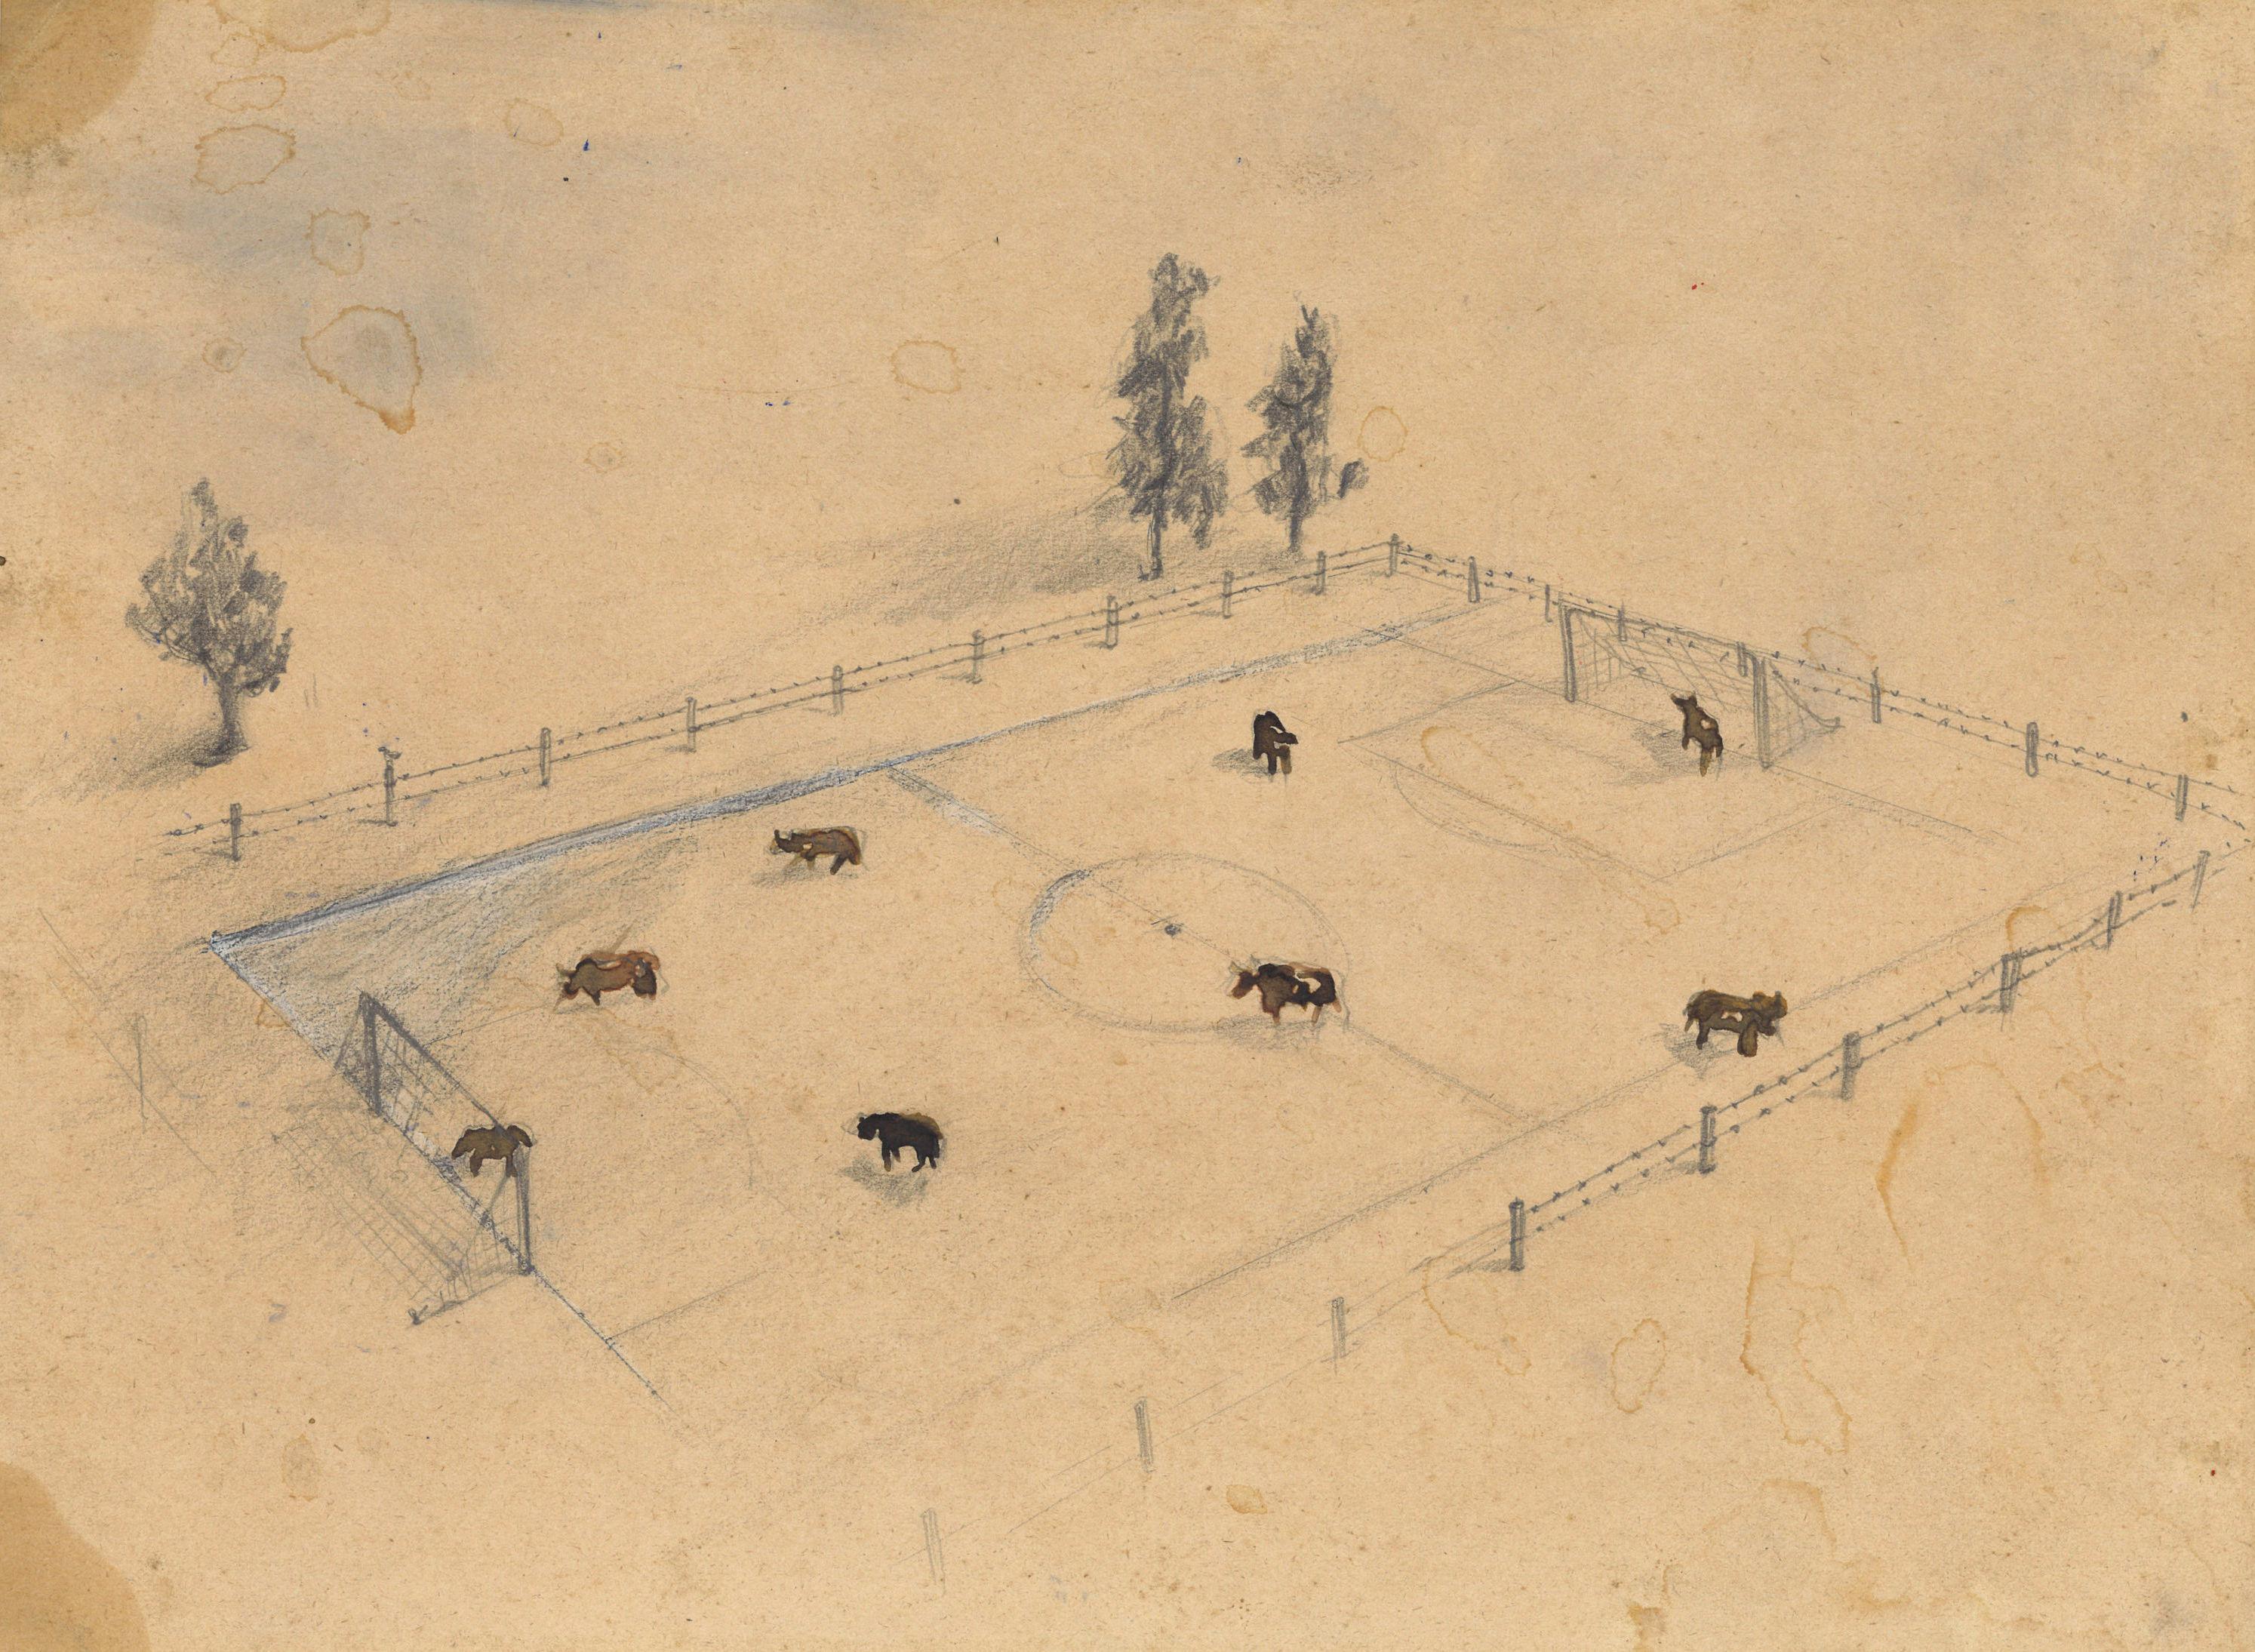 cow-football